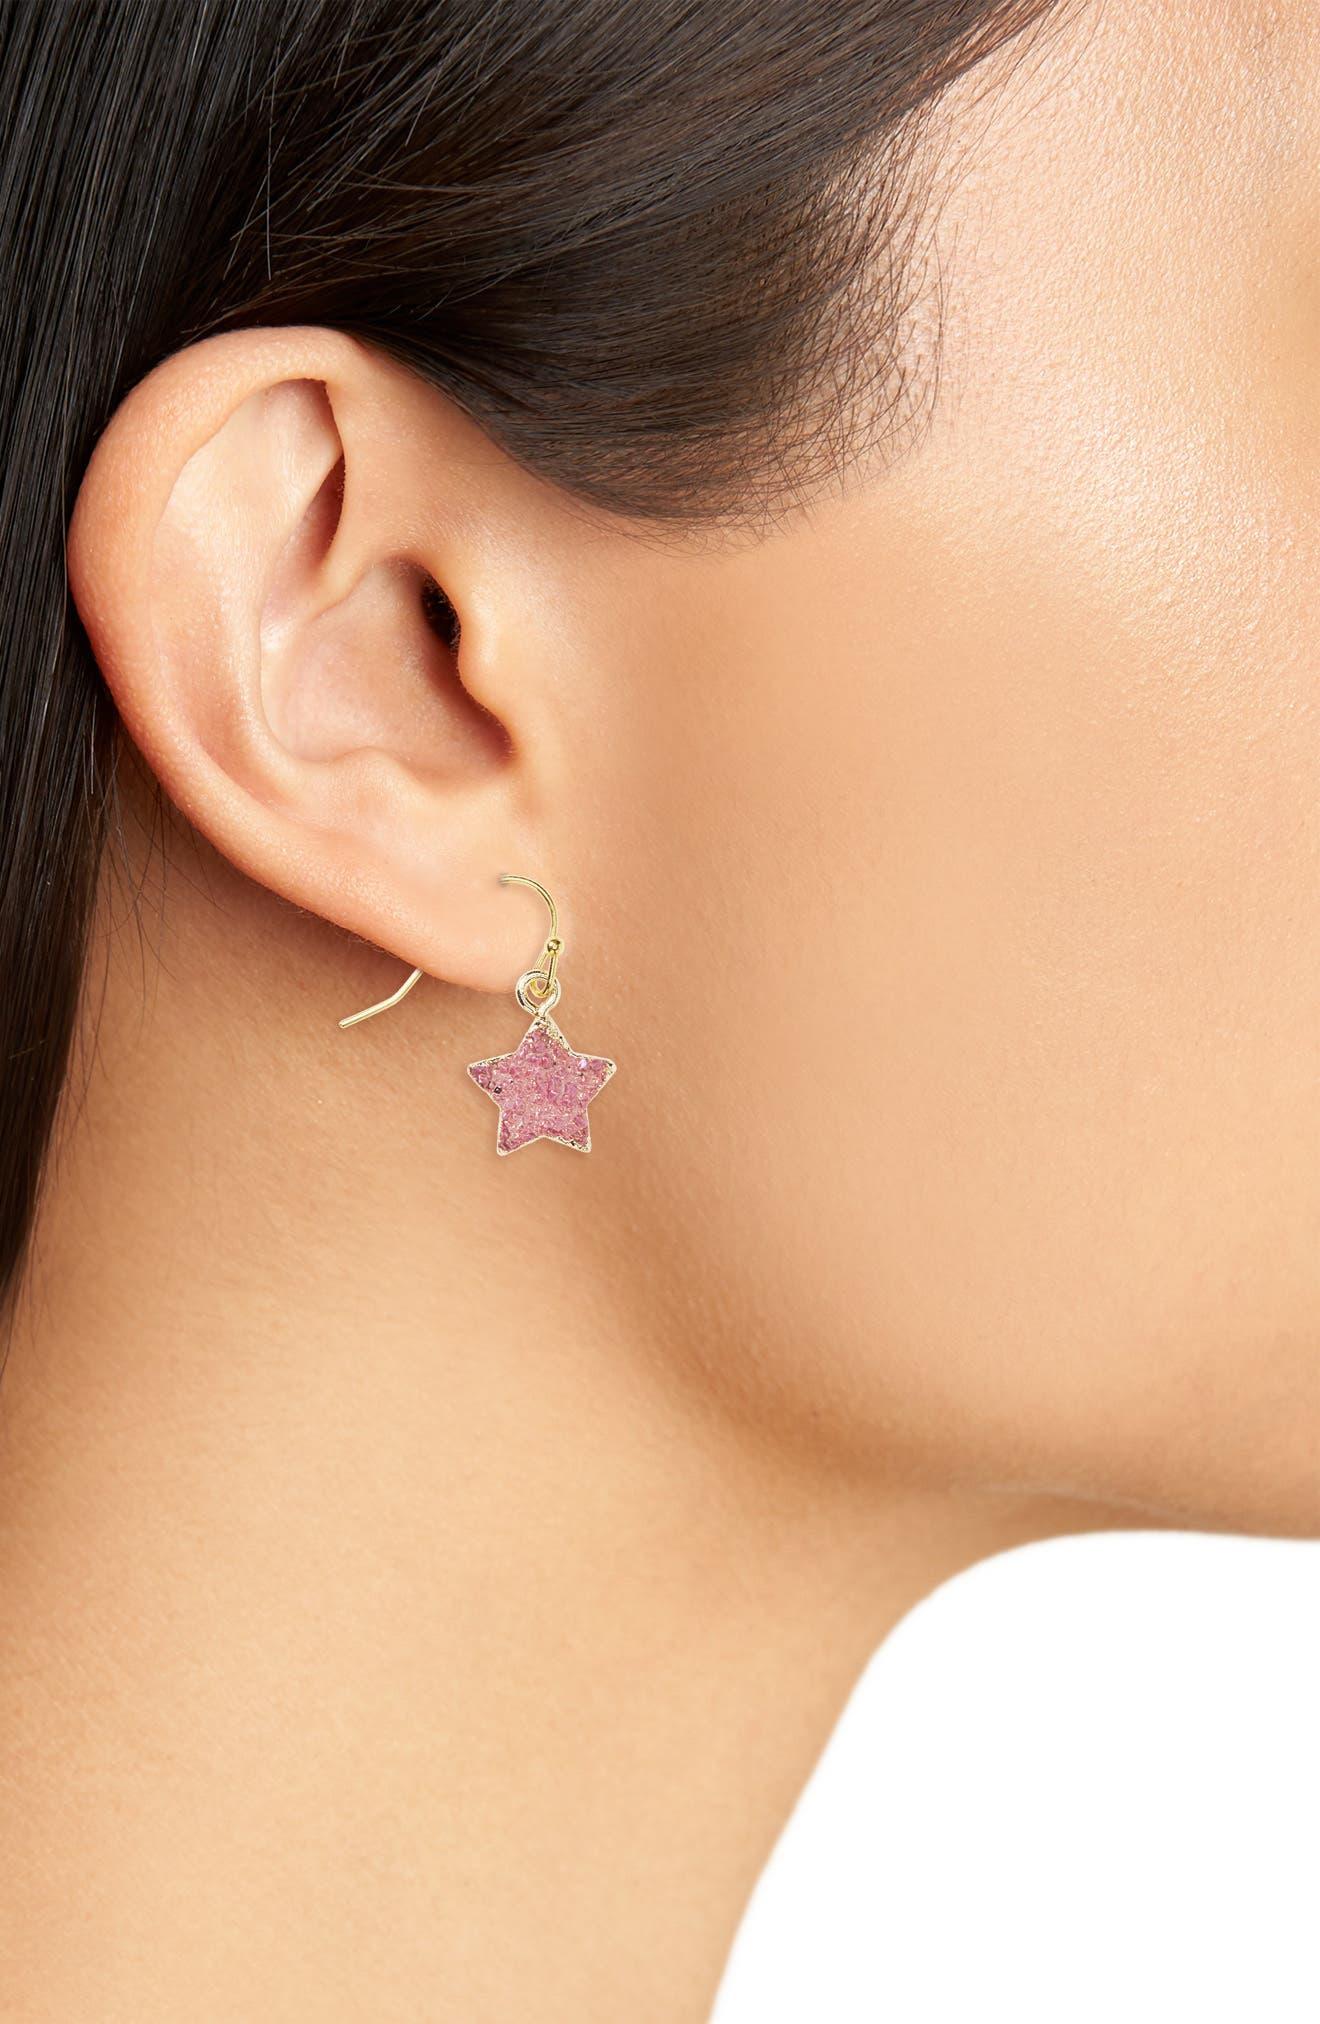 Moon & Star Drusy Stone Earrings,                             Alternate thumbnail 2, color,                             Blue